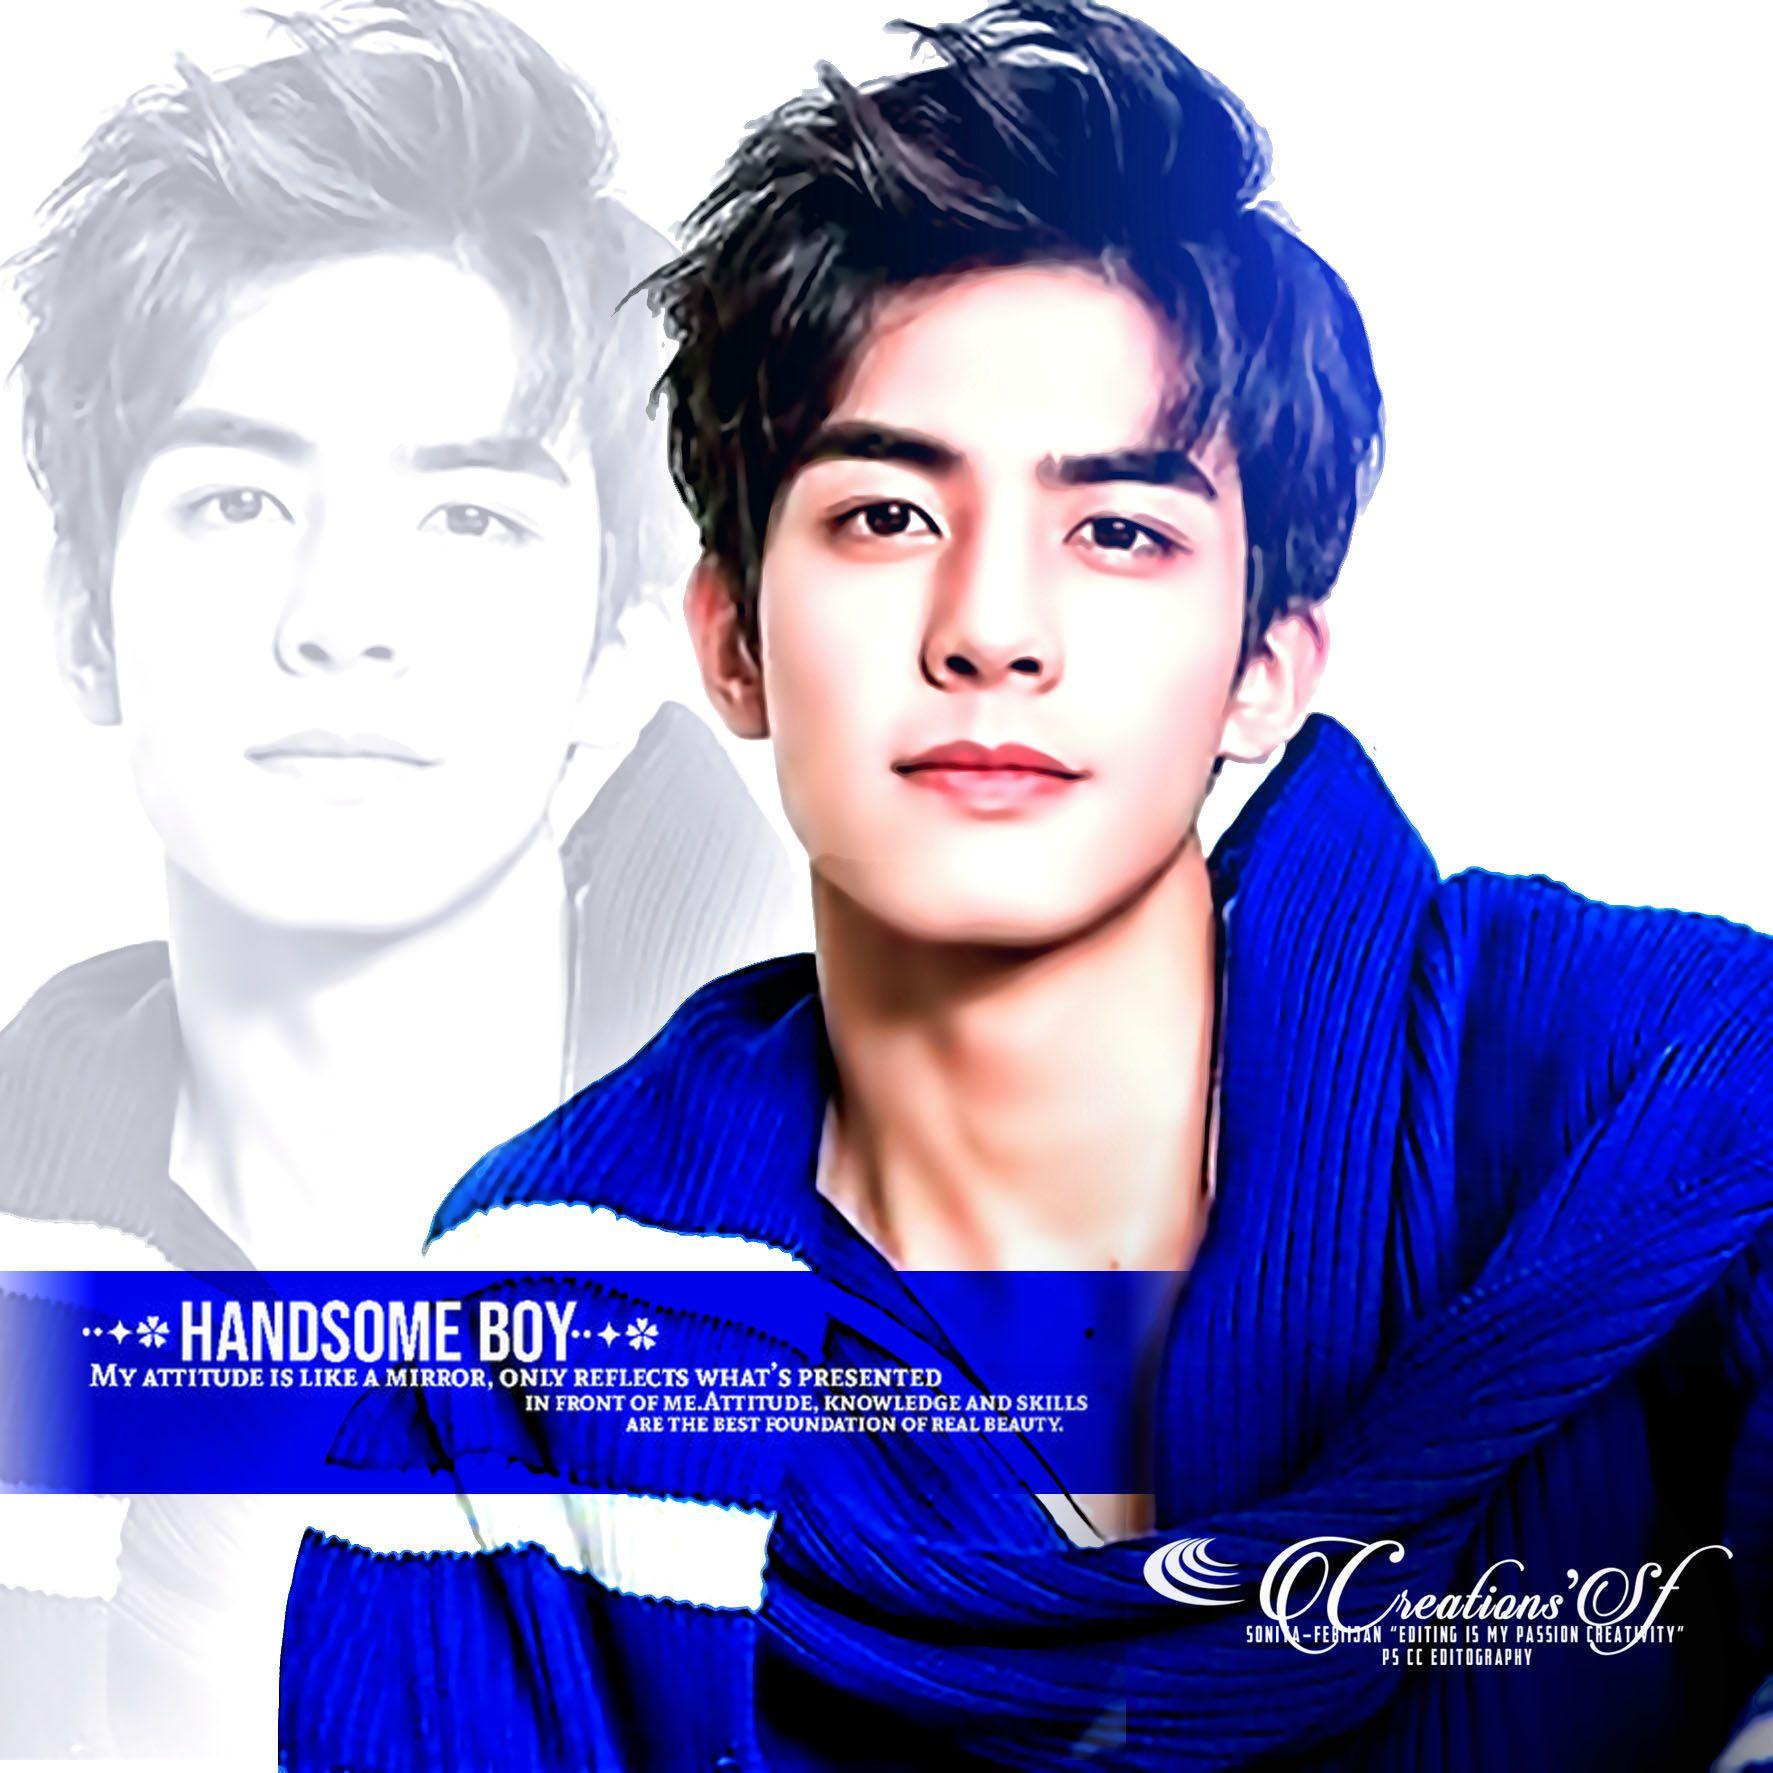 Korea Style Dp Cover Stylish Boys Handsome Boys Baby Girl Fashion